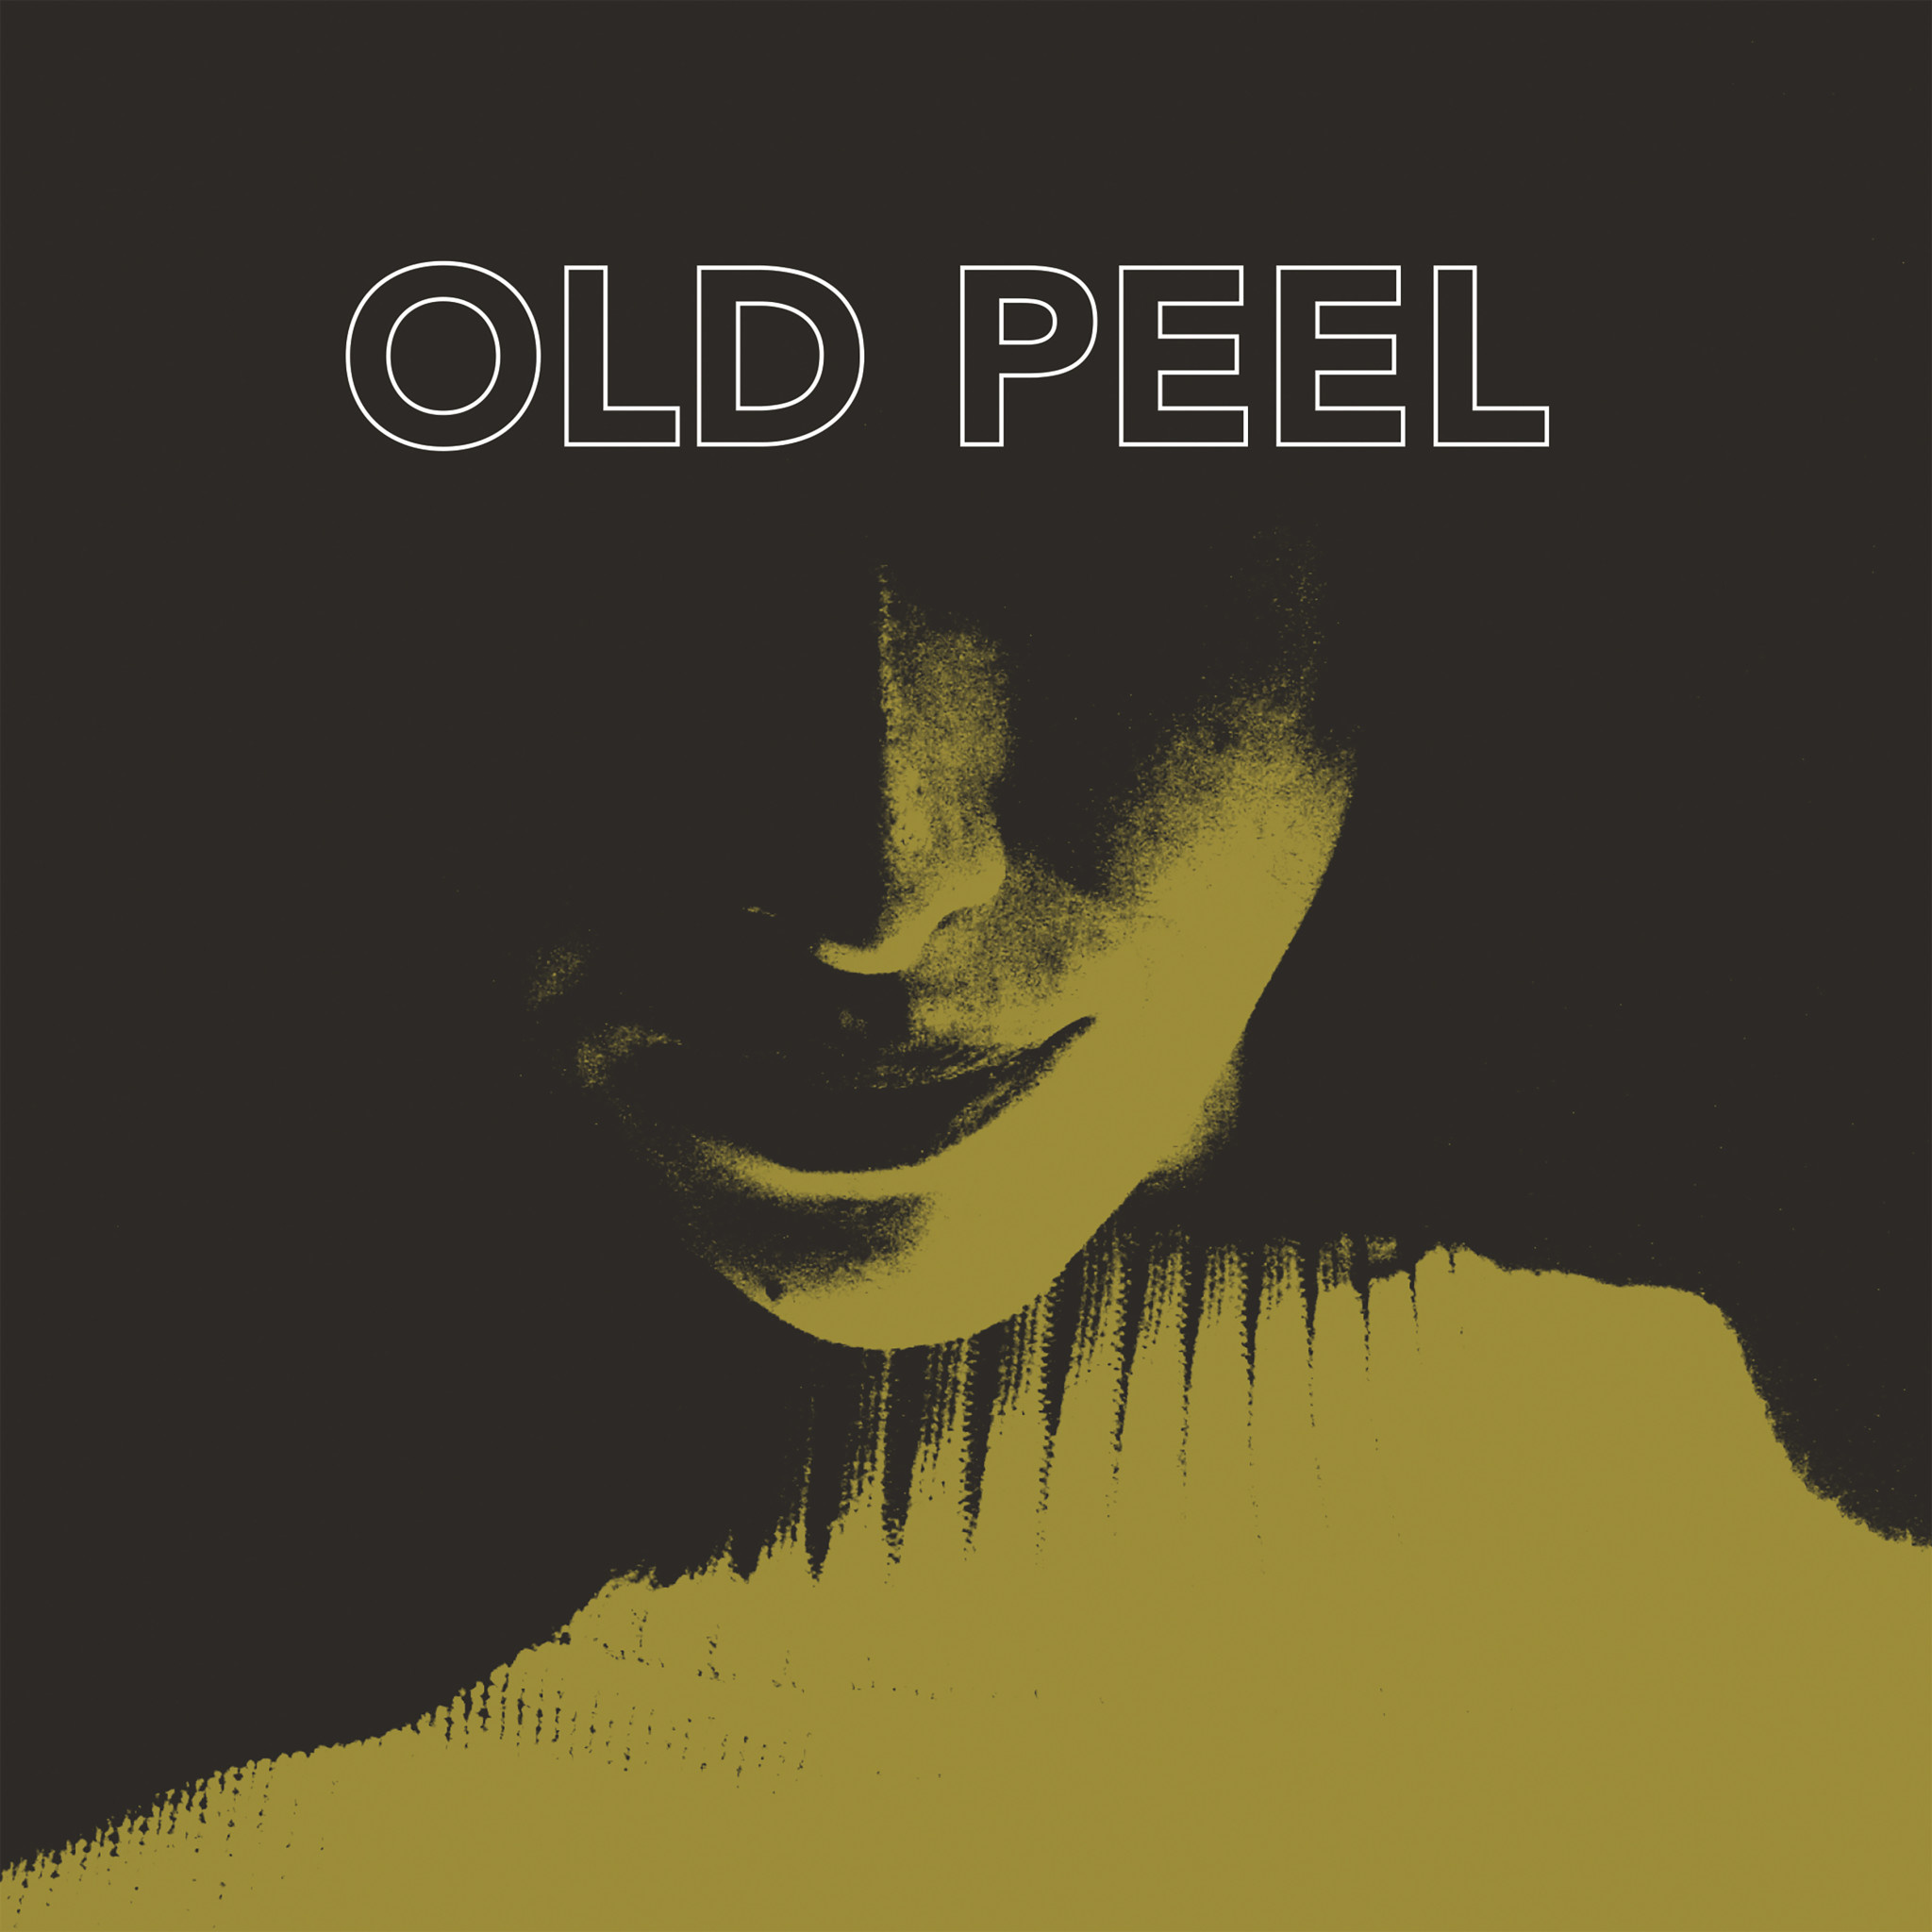 4AD Aldous Harding - Old Peel